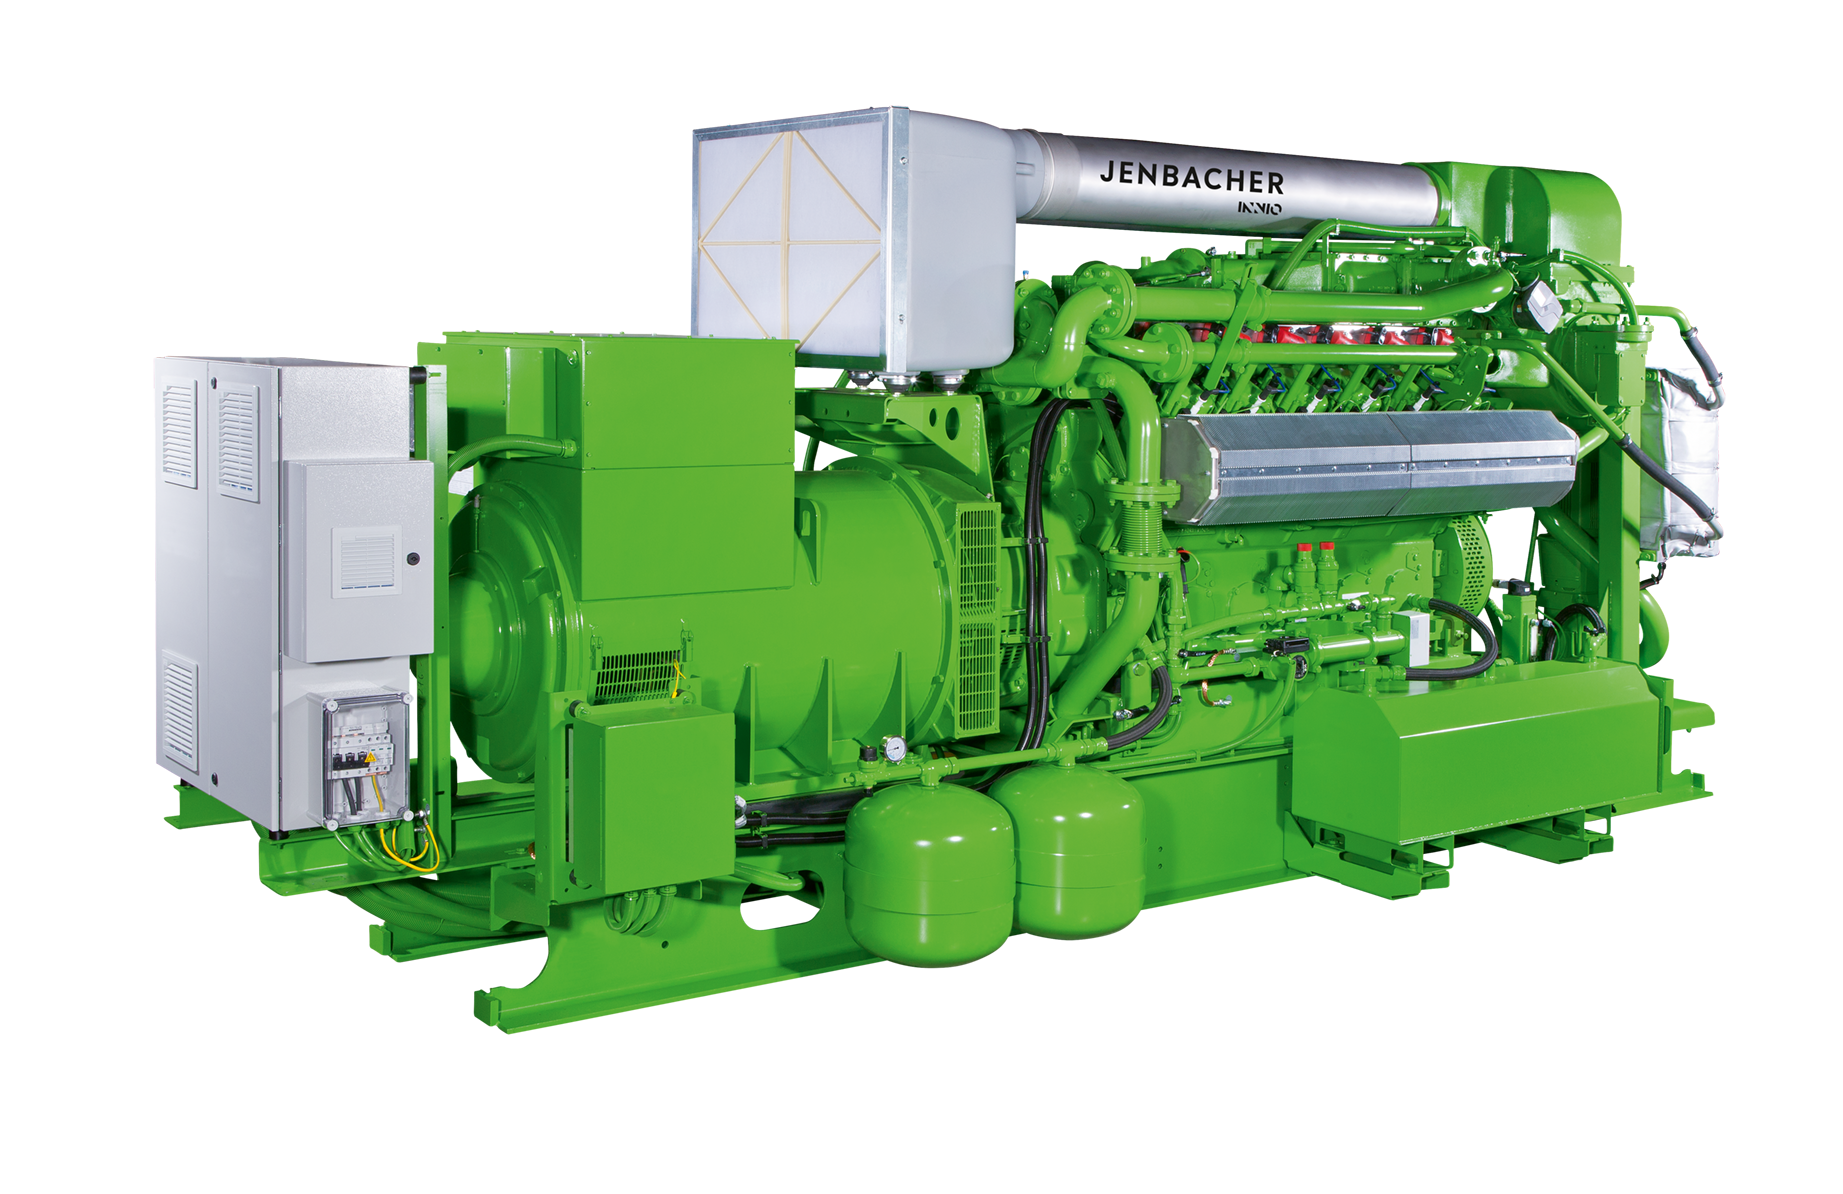 Газопоршневая установка Jenbacher 312